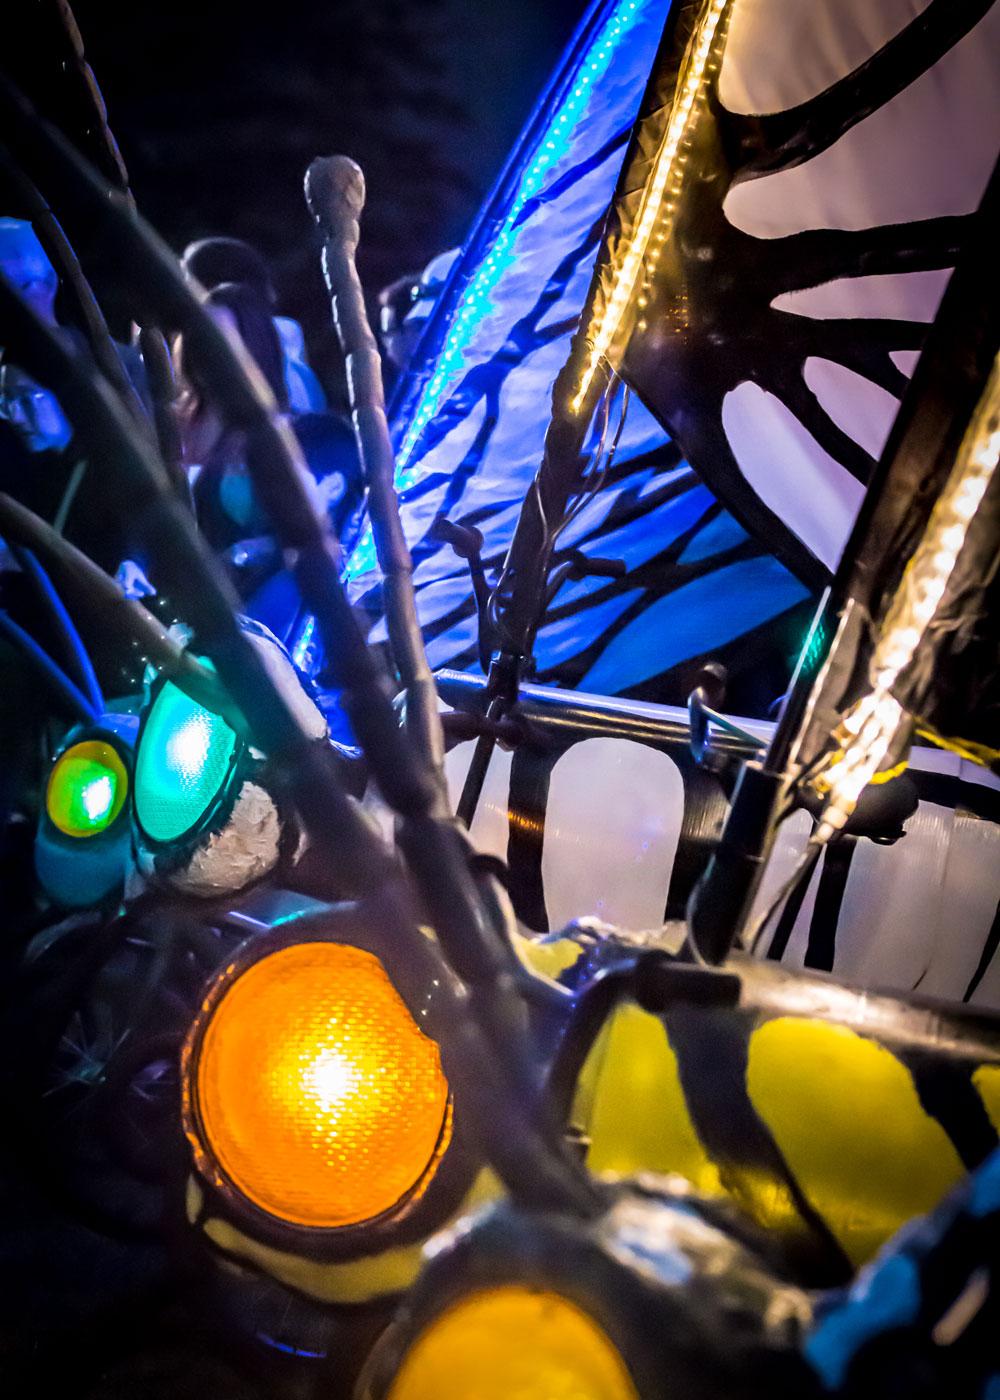 GIANT butterflies - By The Bike Zoo | Breckenridge 2015